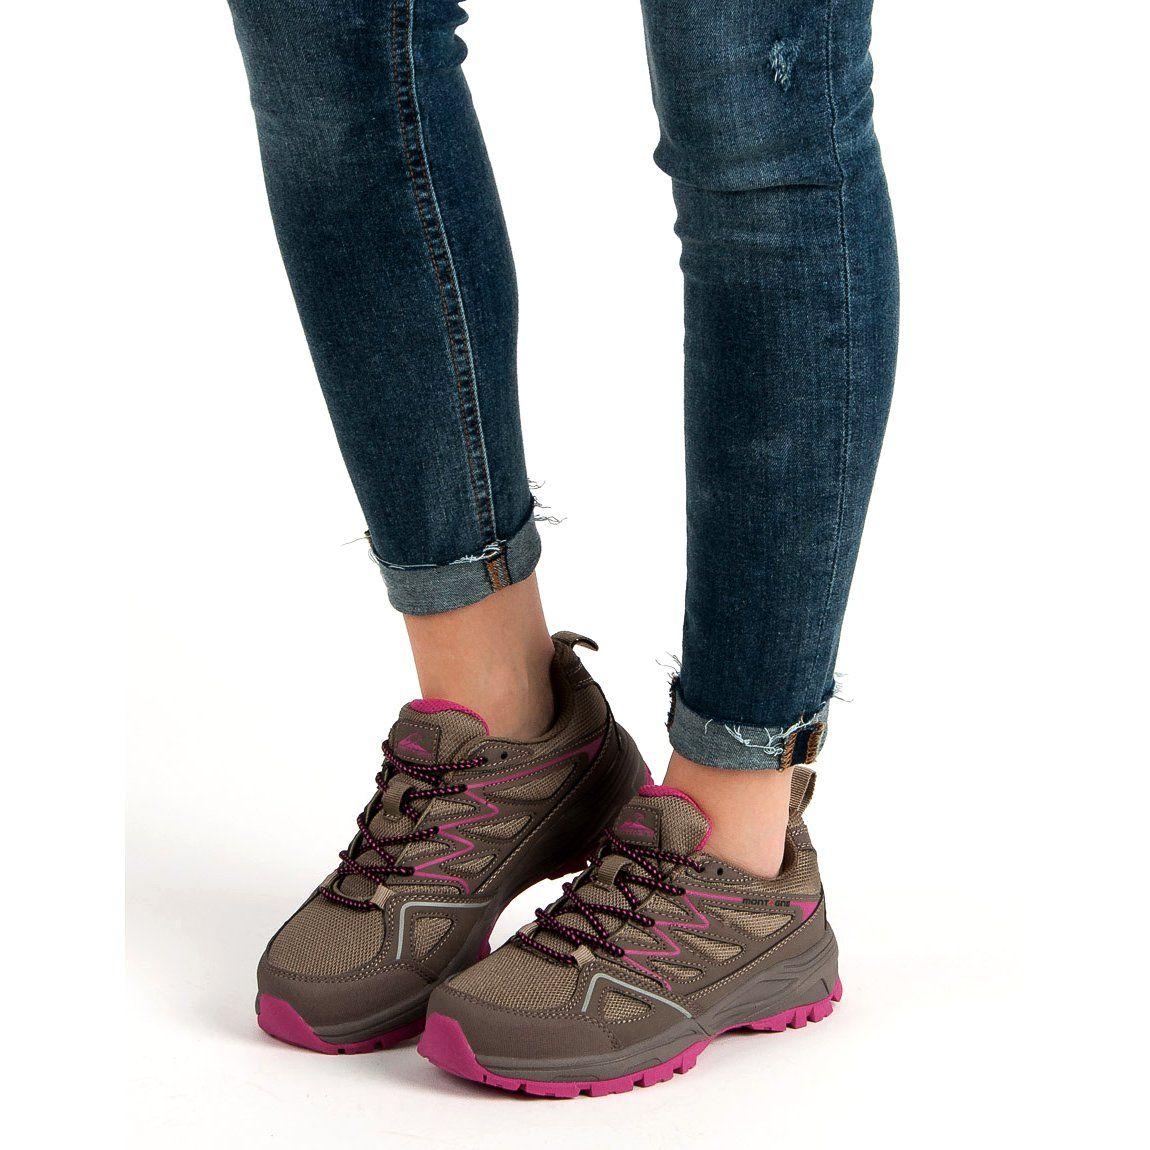 Damskie Buty Trekkingowe Brazowe Hiking Boots Shoes Boots